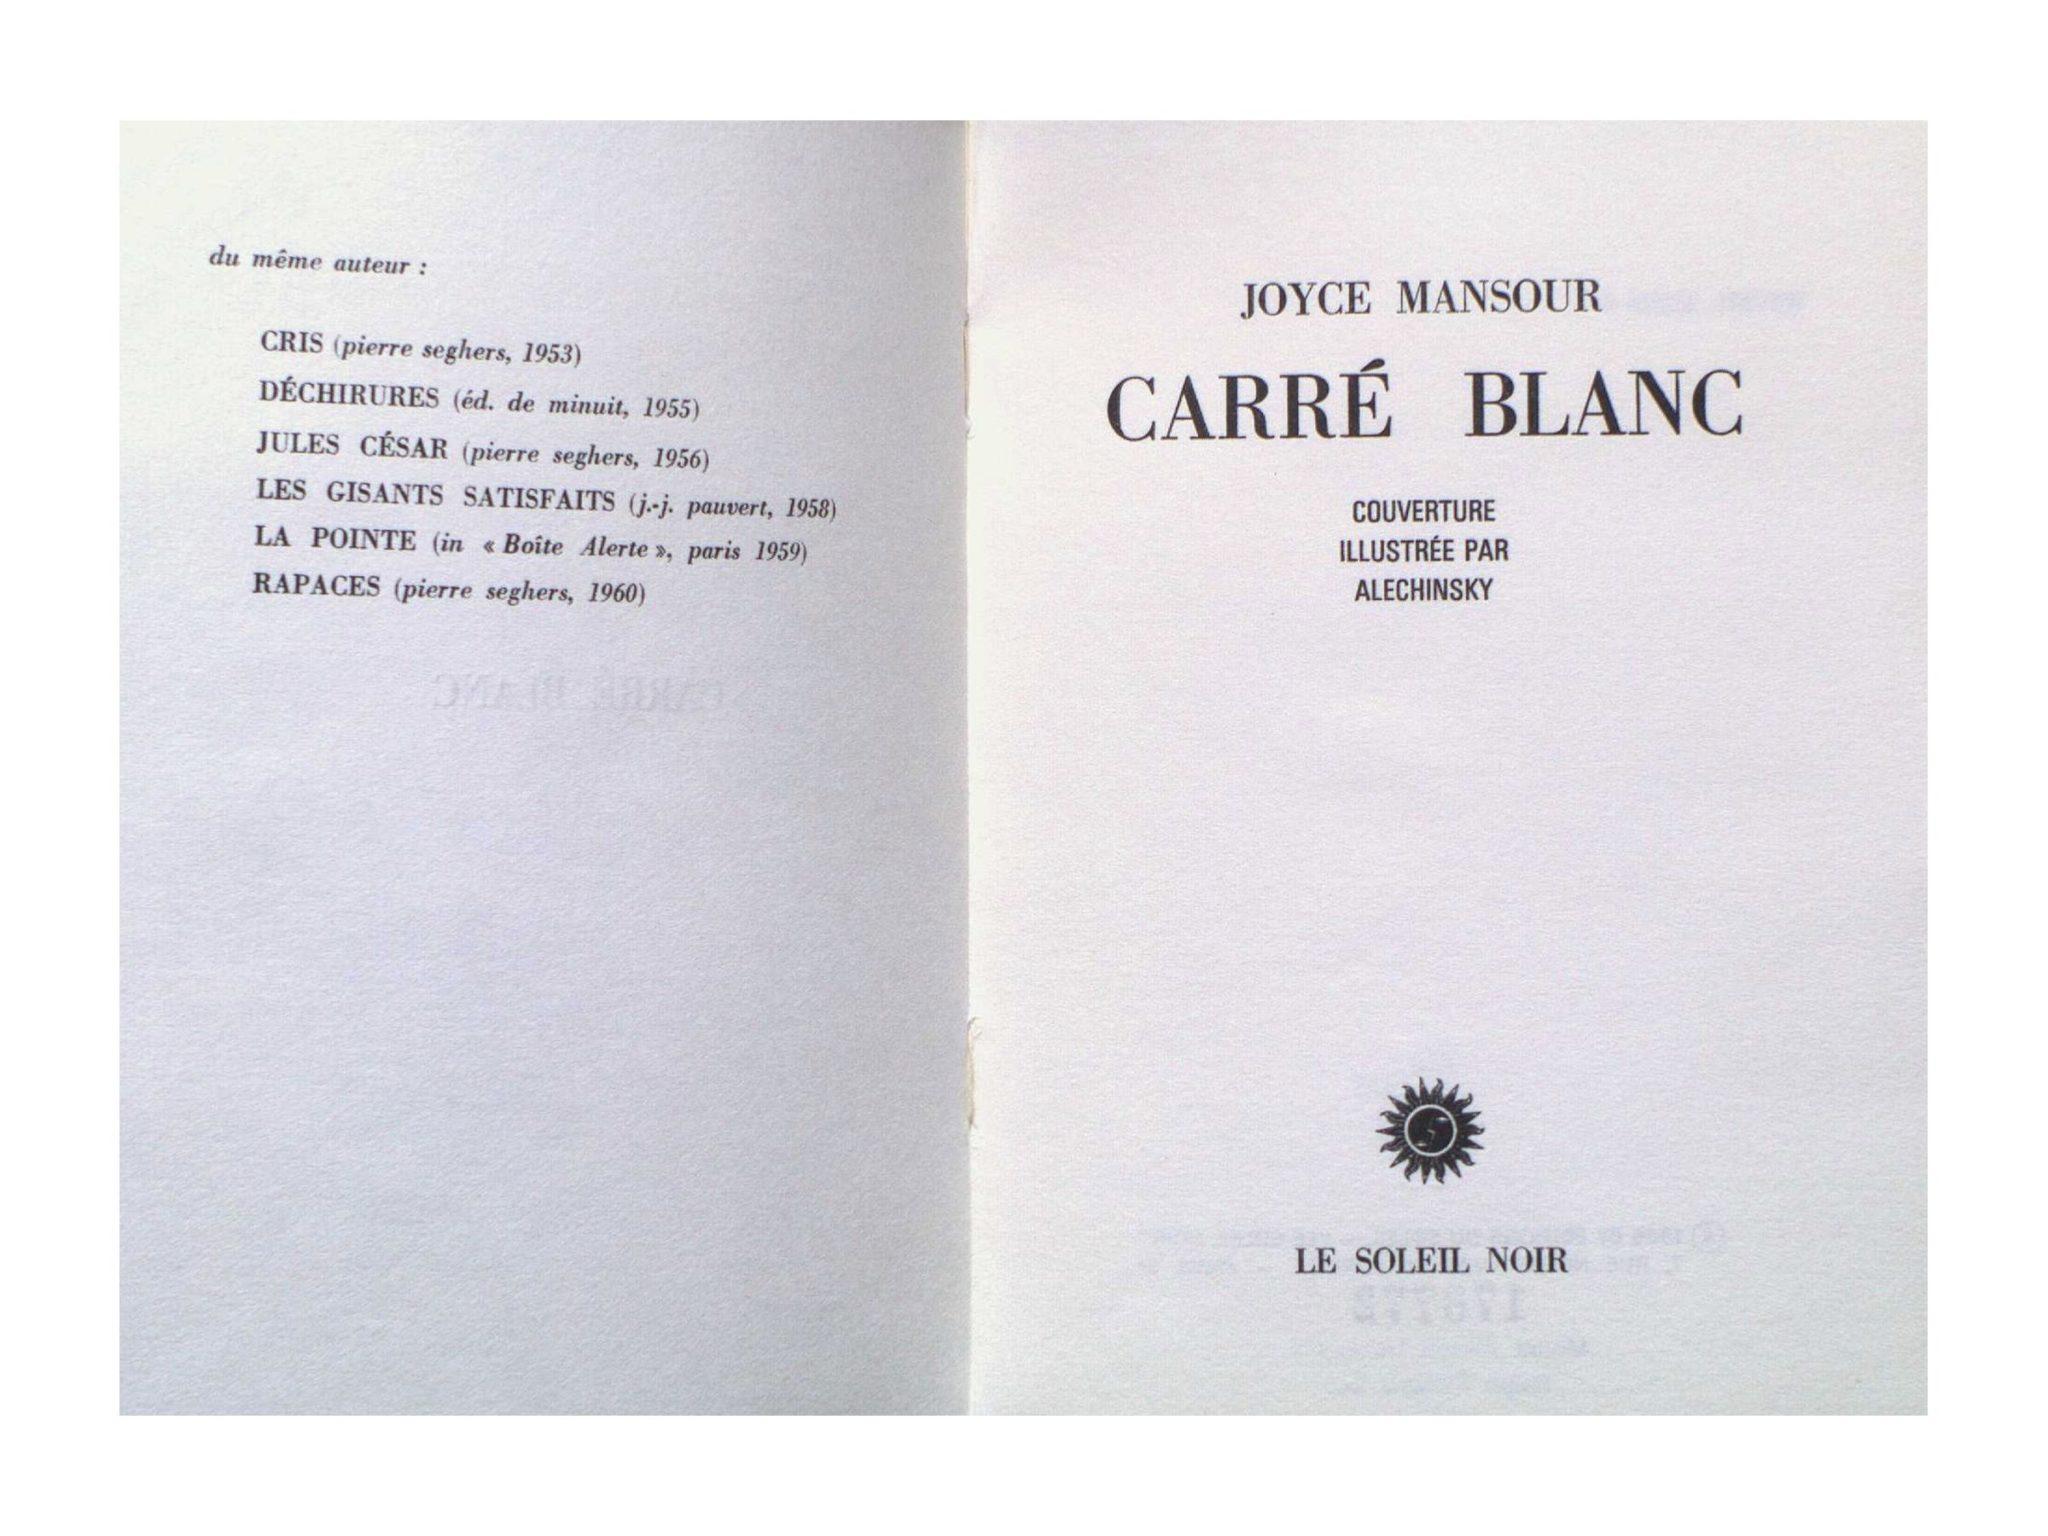 Carrousel-3-Mansour-Joyce_Carre-blanc